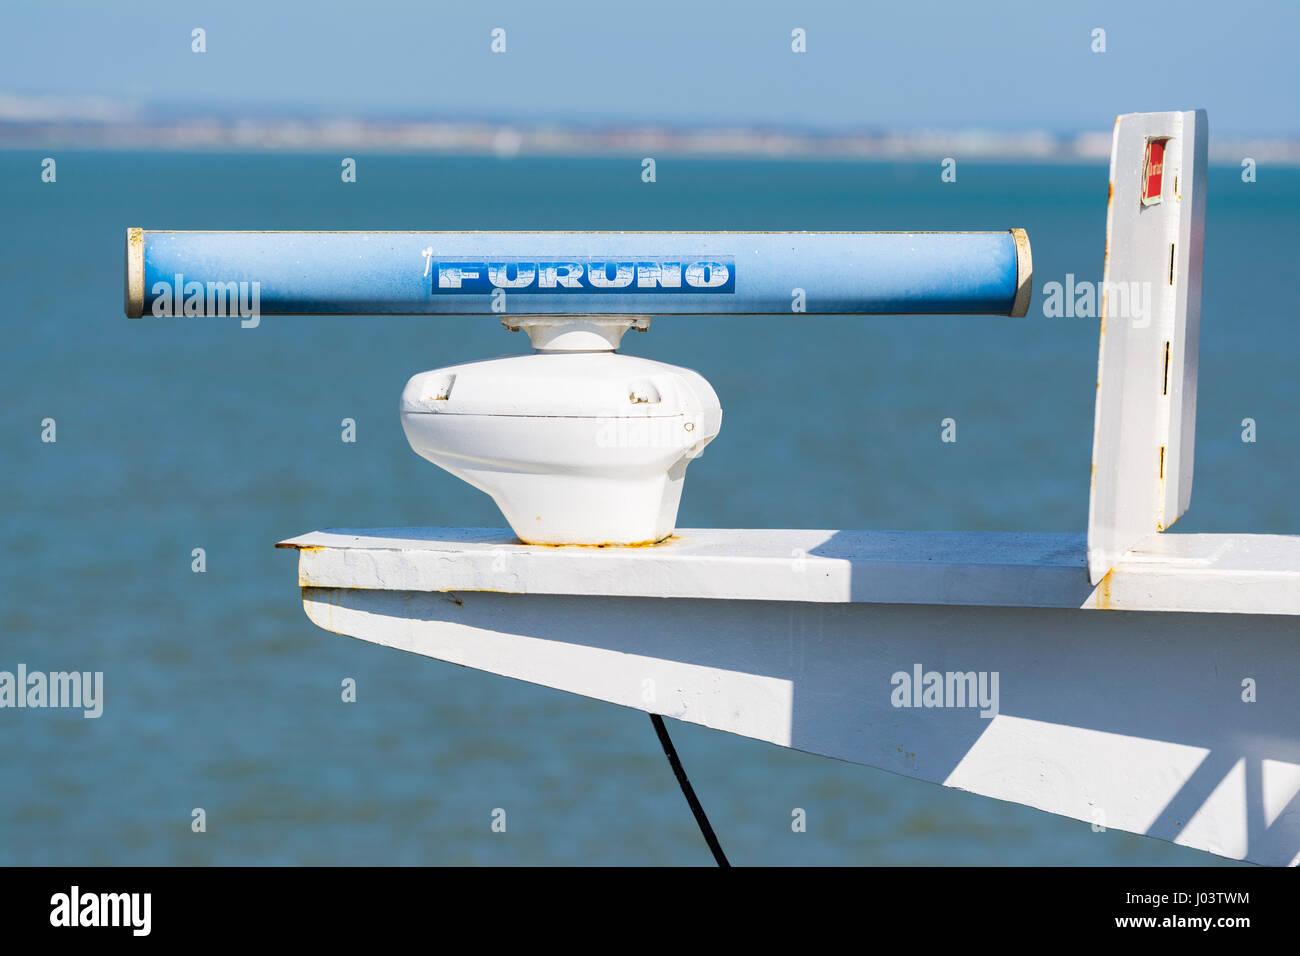 Furuno marine radar sensor on a ship at sea. - Stock Image